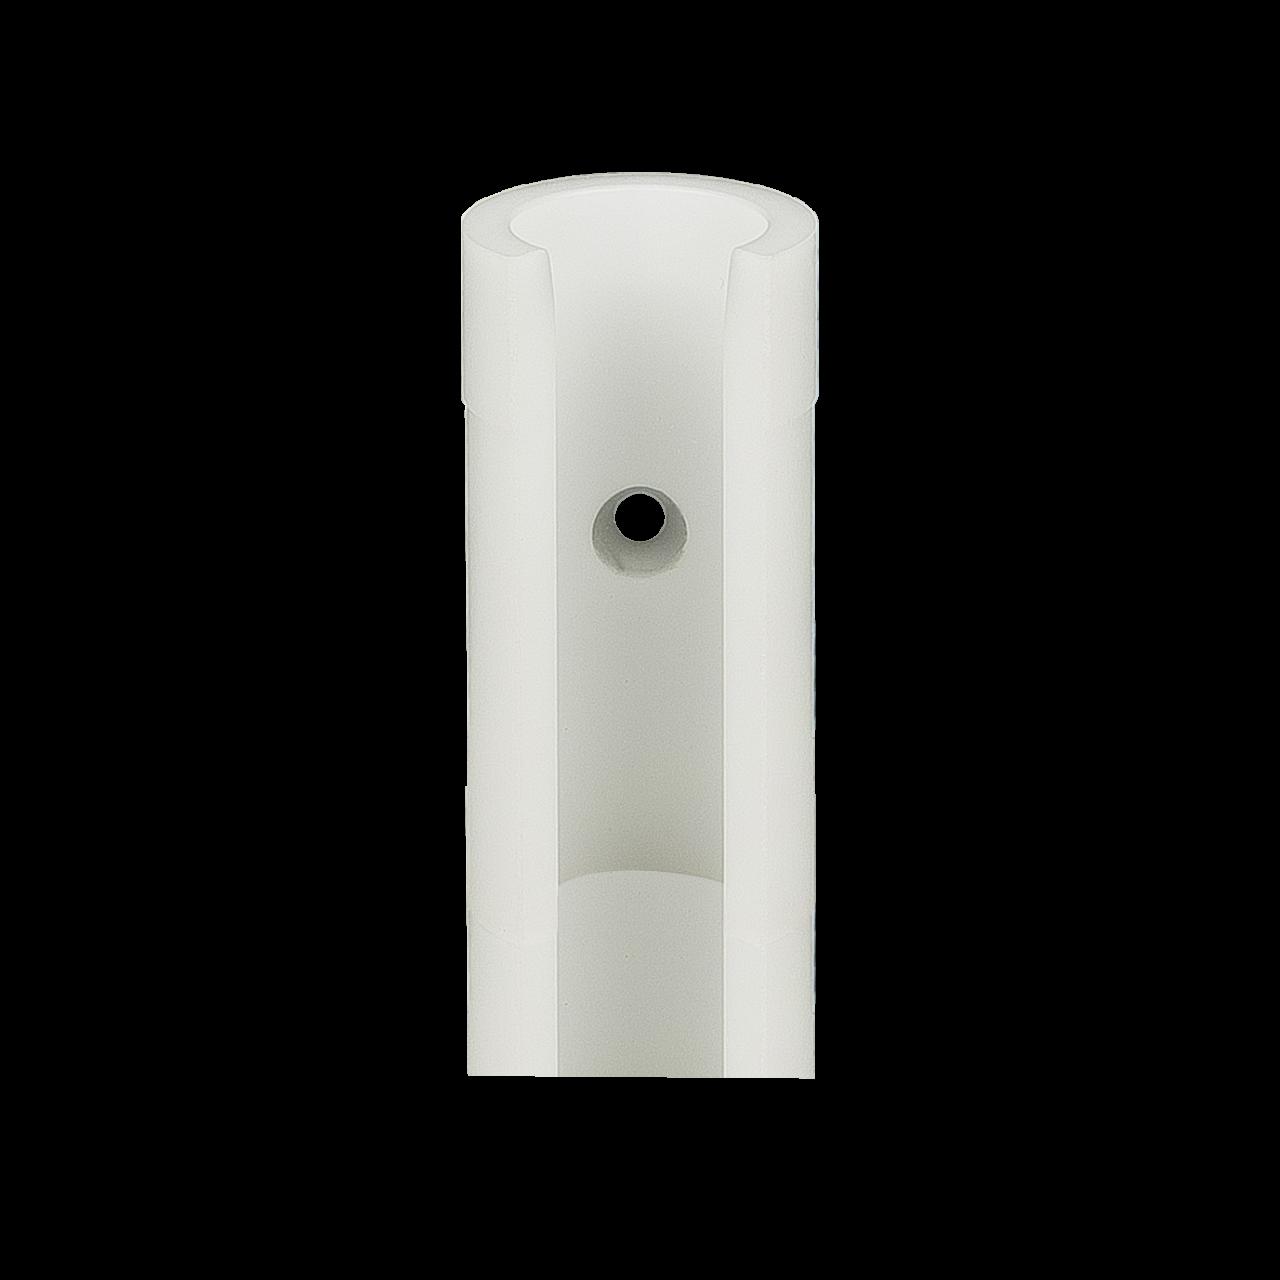 Handstückhaltereinsatz S 950